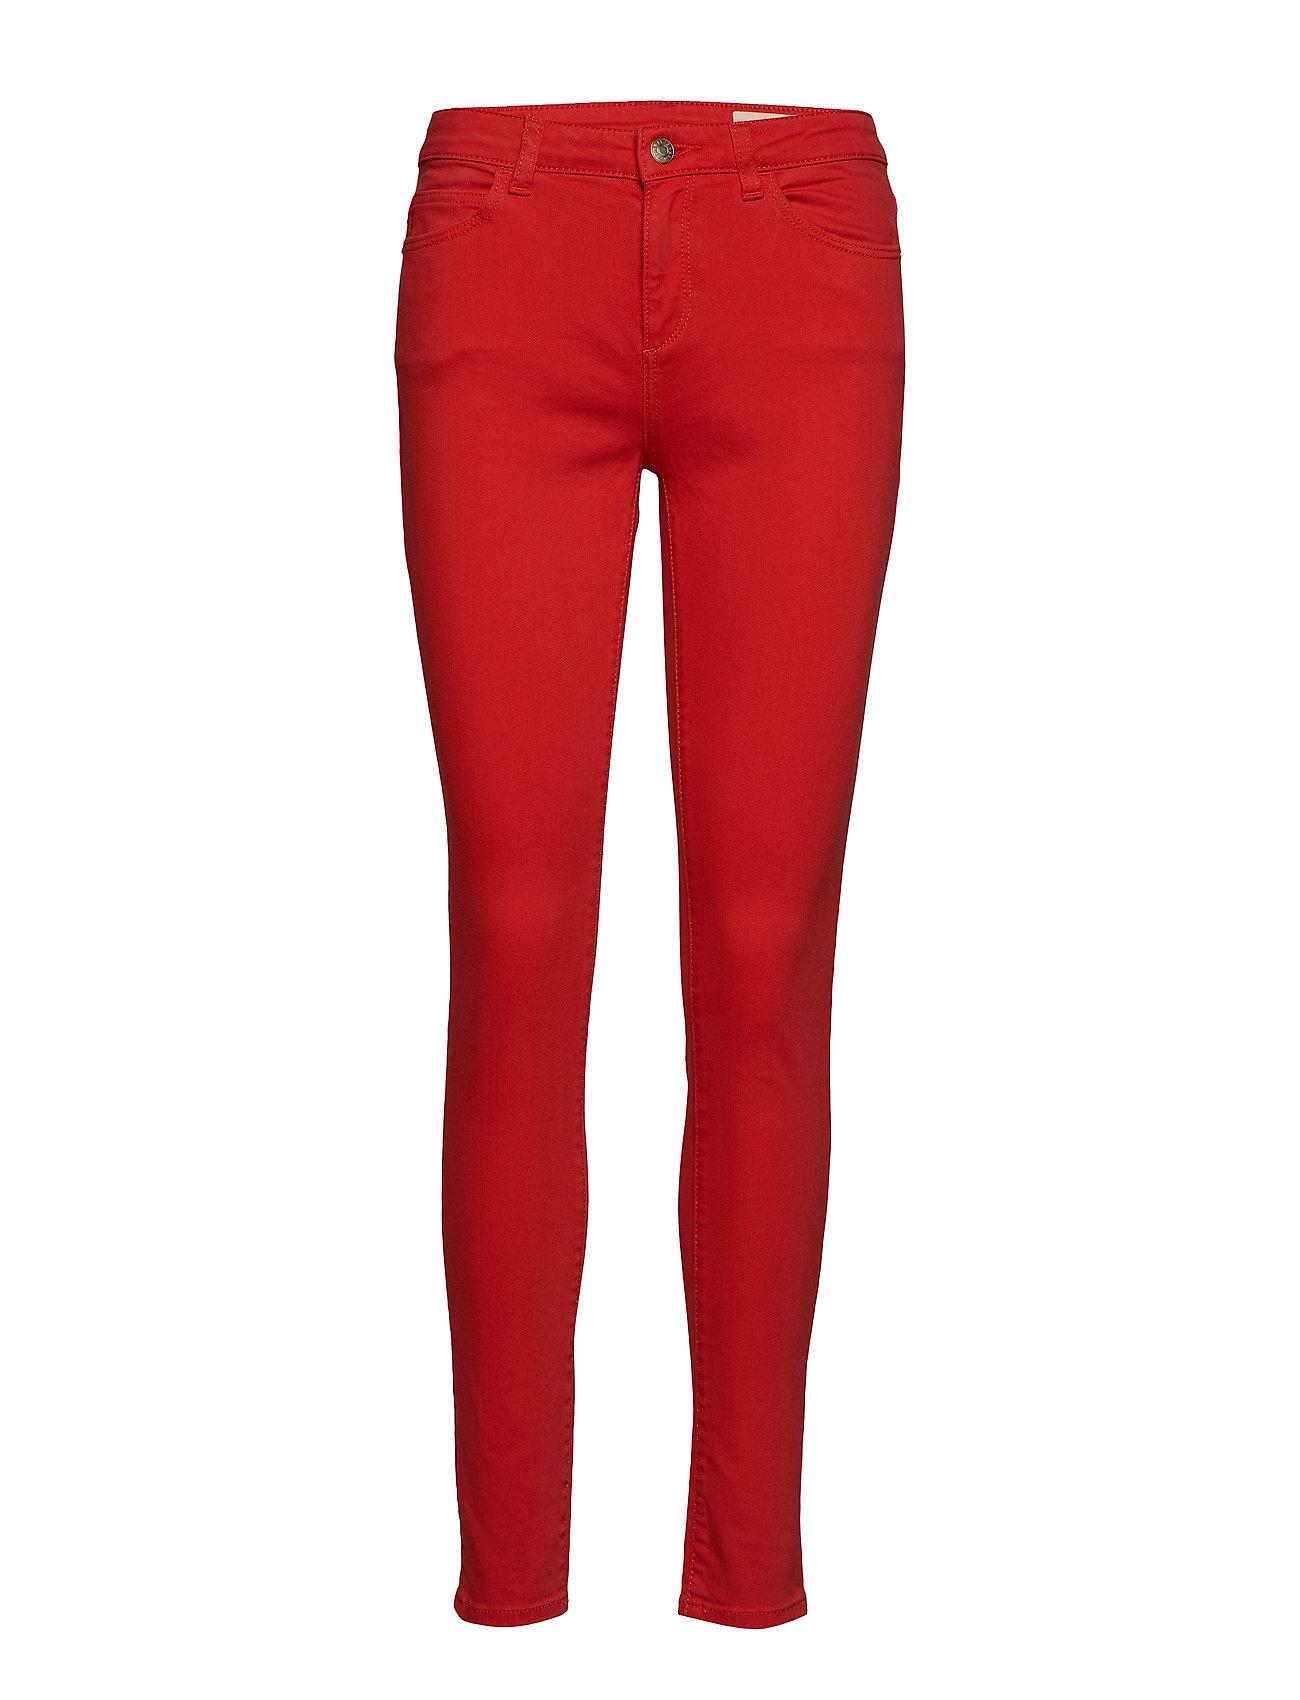 Esprit Casual Pants denim - RED